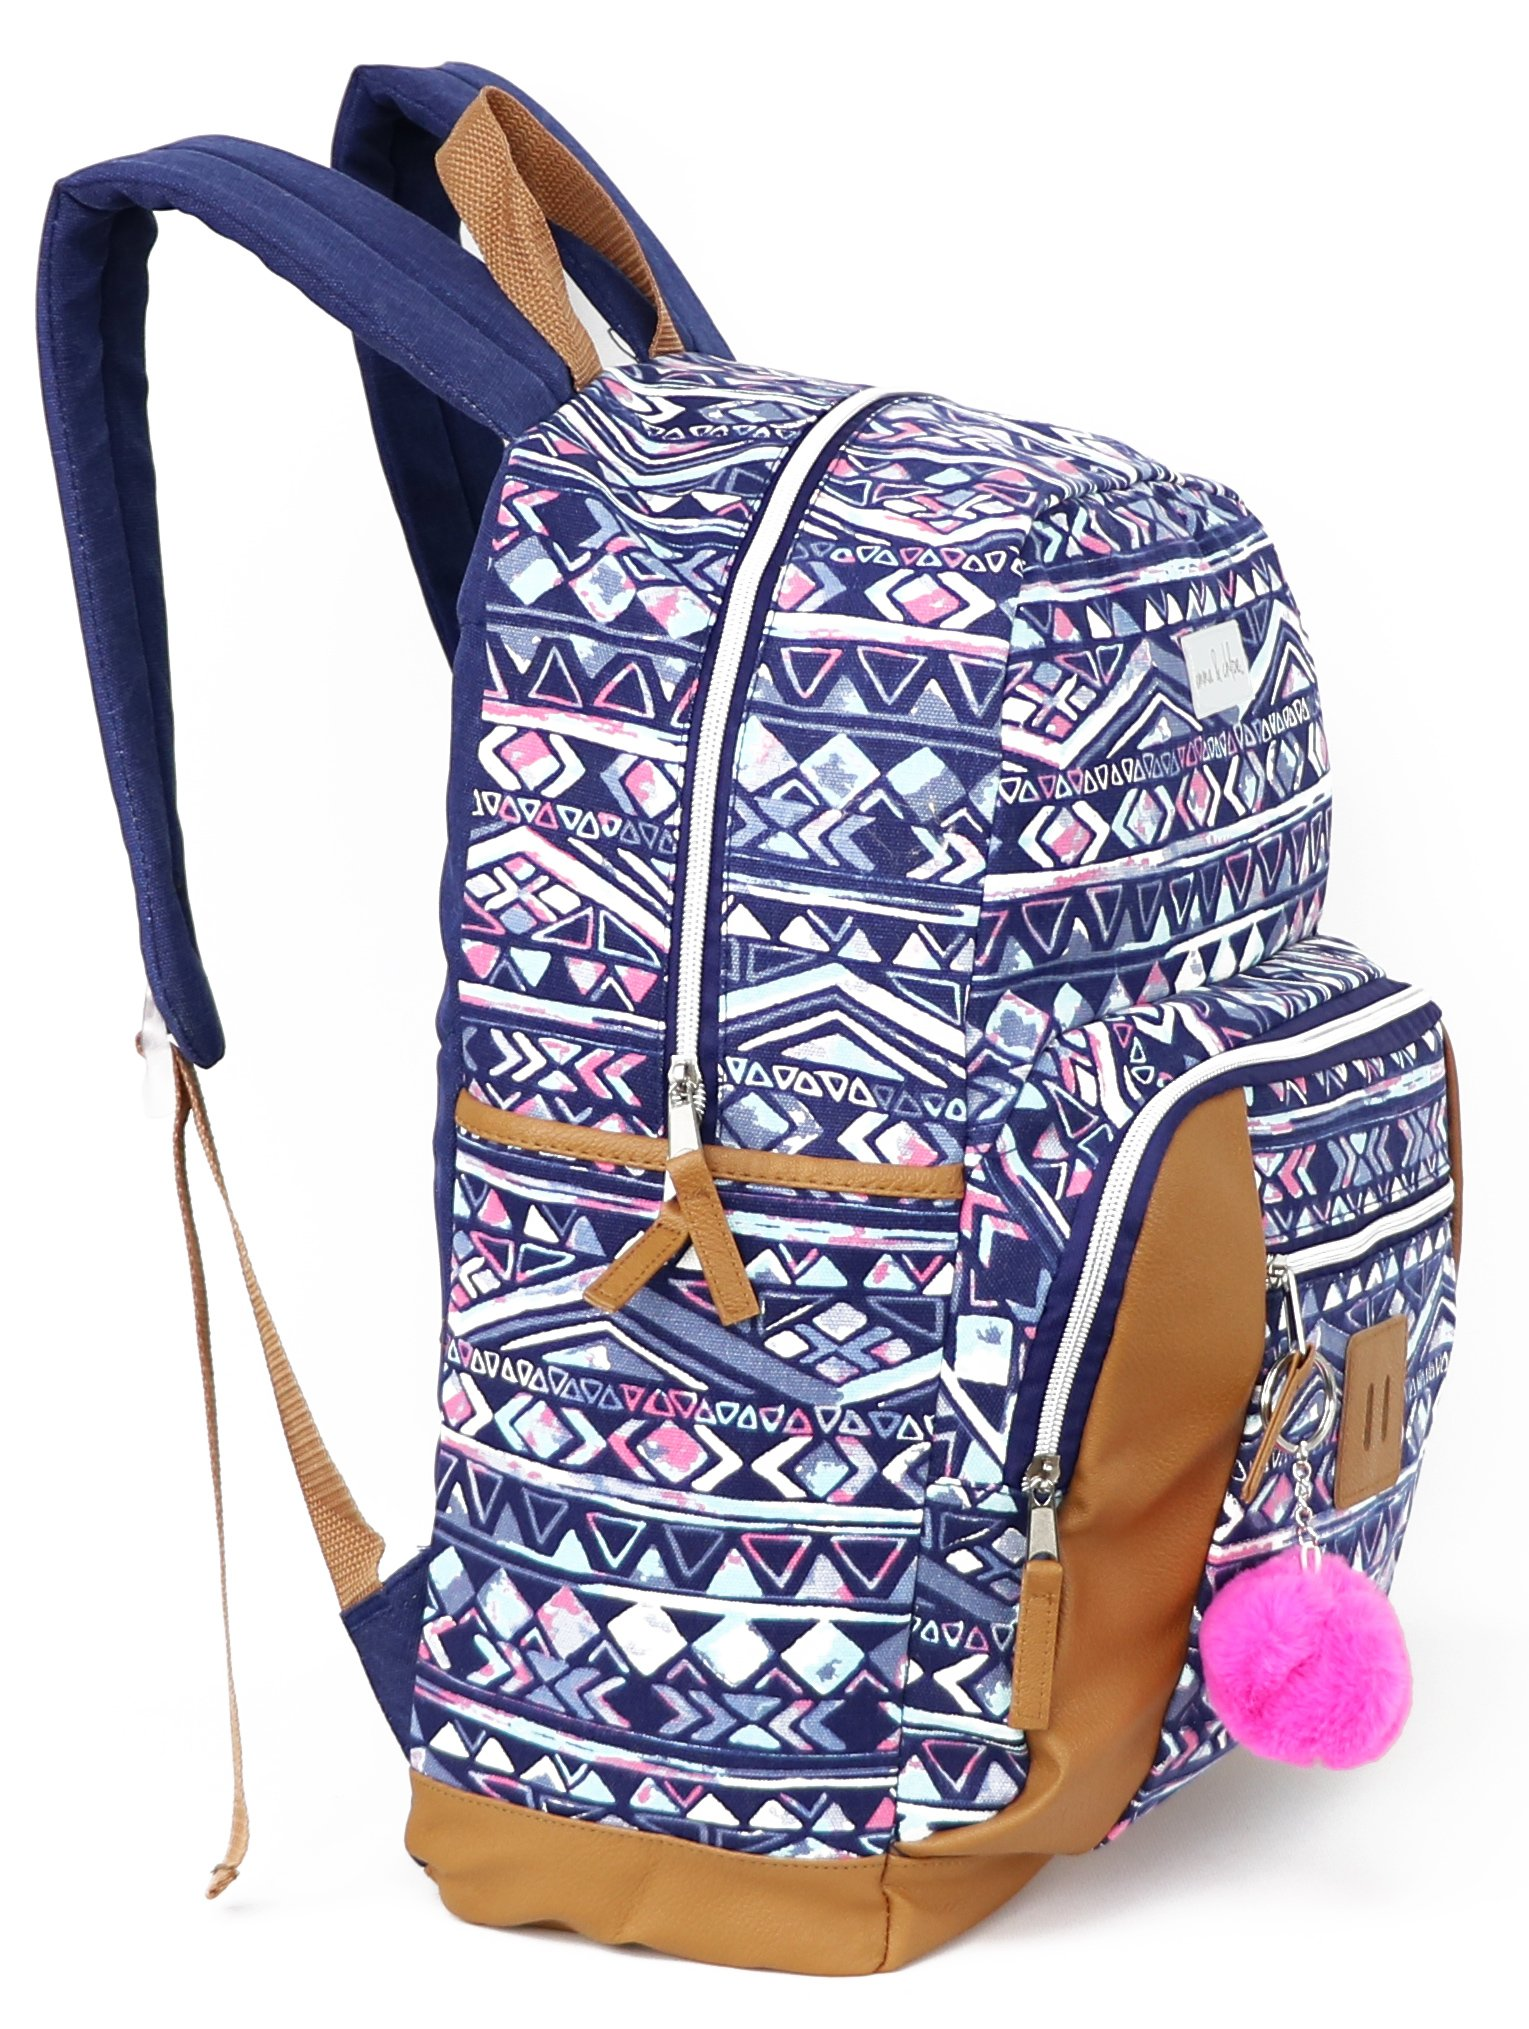 Emma & Chloe Girls Aztec Pom-Pom Vinyl-Base Cotton Backpack (One Size, Aztec Navy) by Trail maker (Image #3)